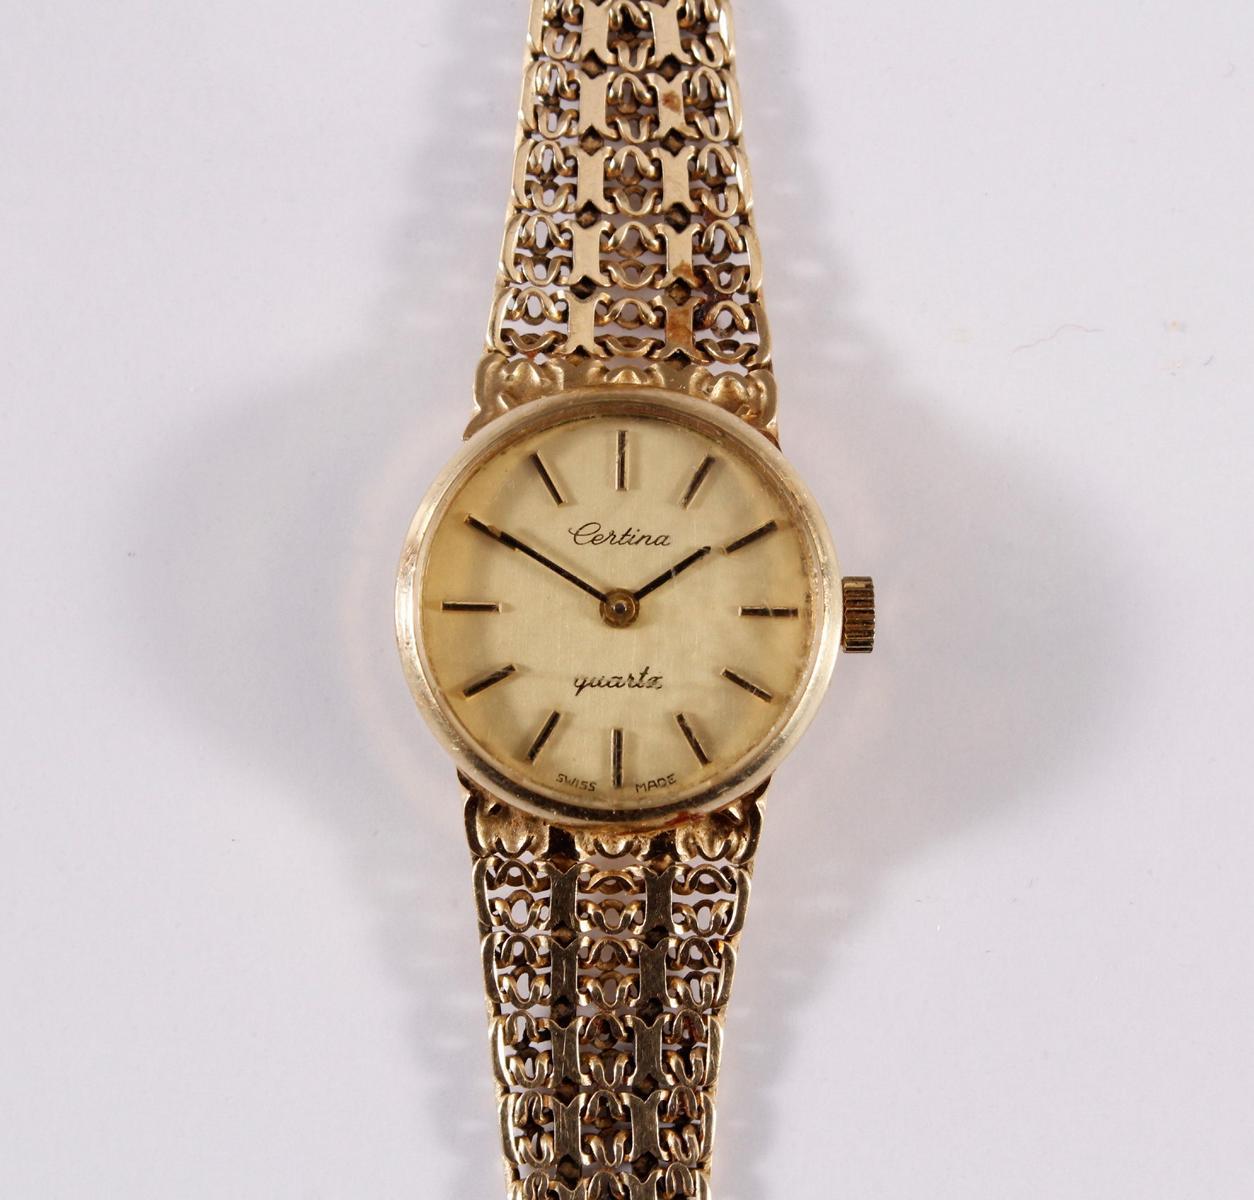 Damenarmbanduhr der Marke Sertina, 14 kt Gelbgold-2